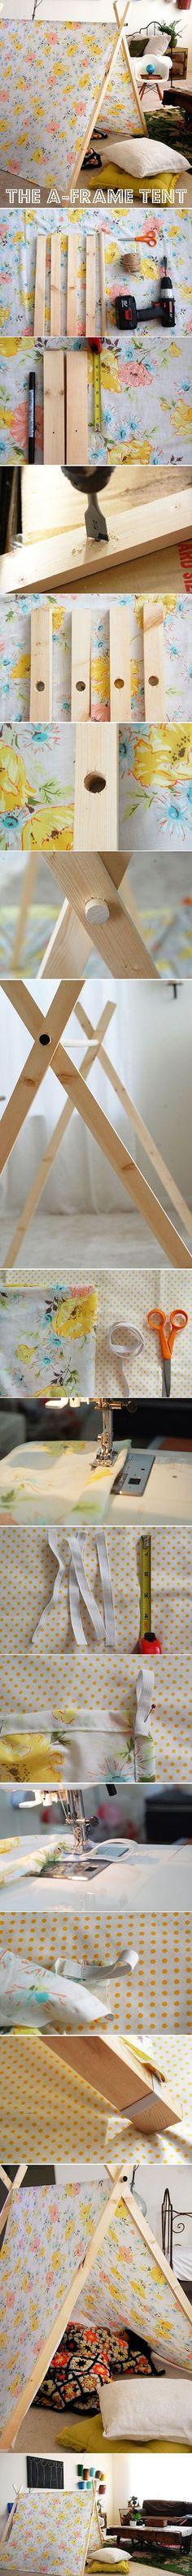 Diy A-frame Tent | DIY  Crafts Tutorials